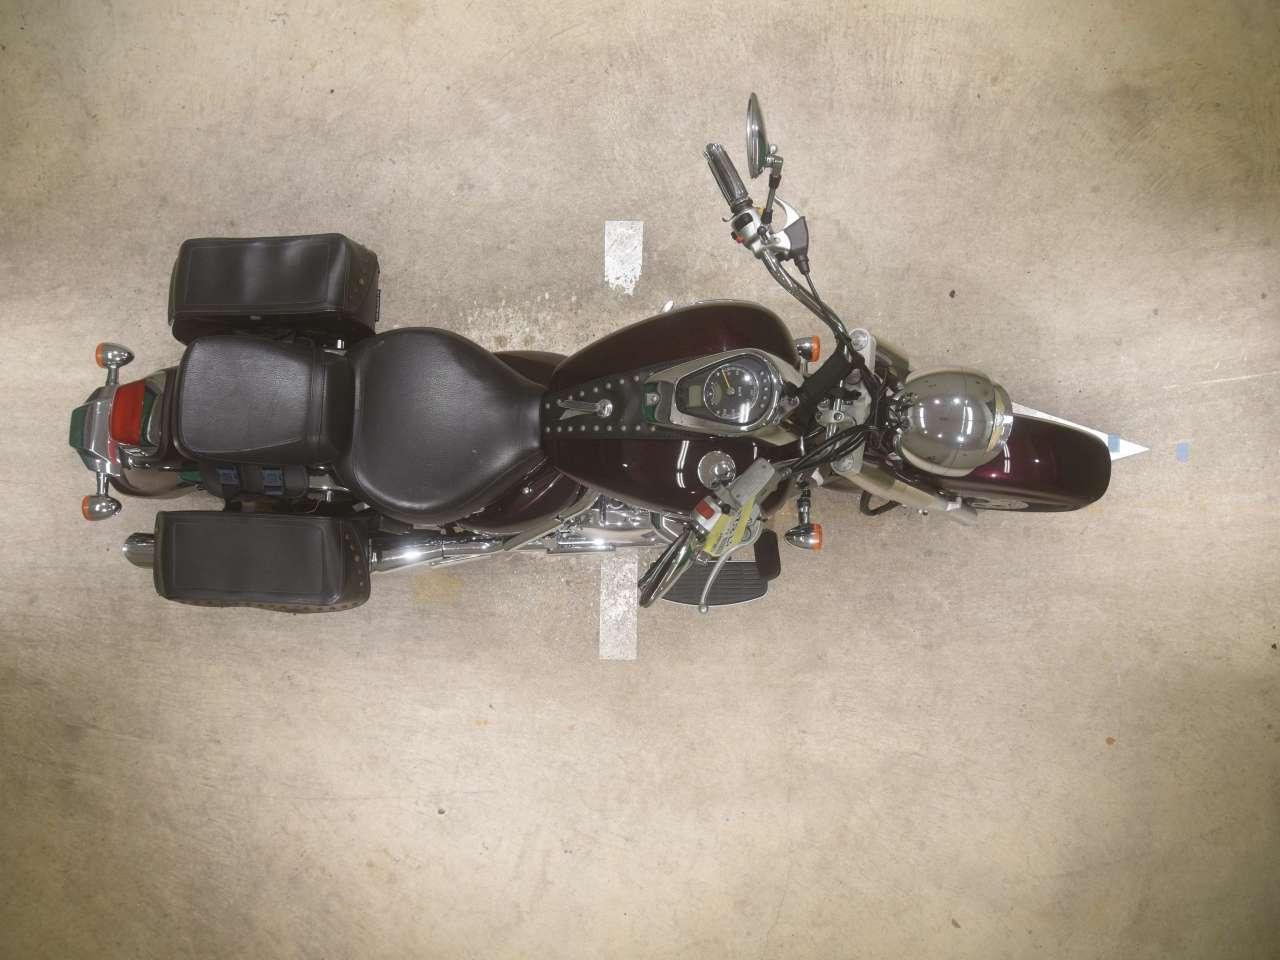 МОТОЦИКЛ SUZUKI INTRUDER 400 Classic 2009  Артмото - купить квадроцикл в украине и харькове, мотоцикл, снегоход, скутер, мопед, электромобиль